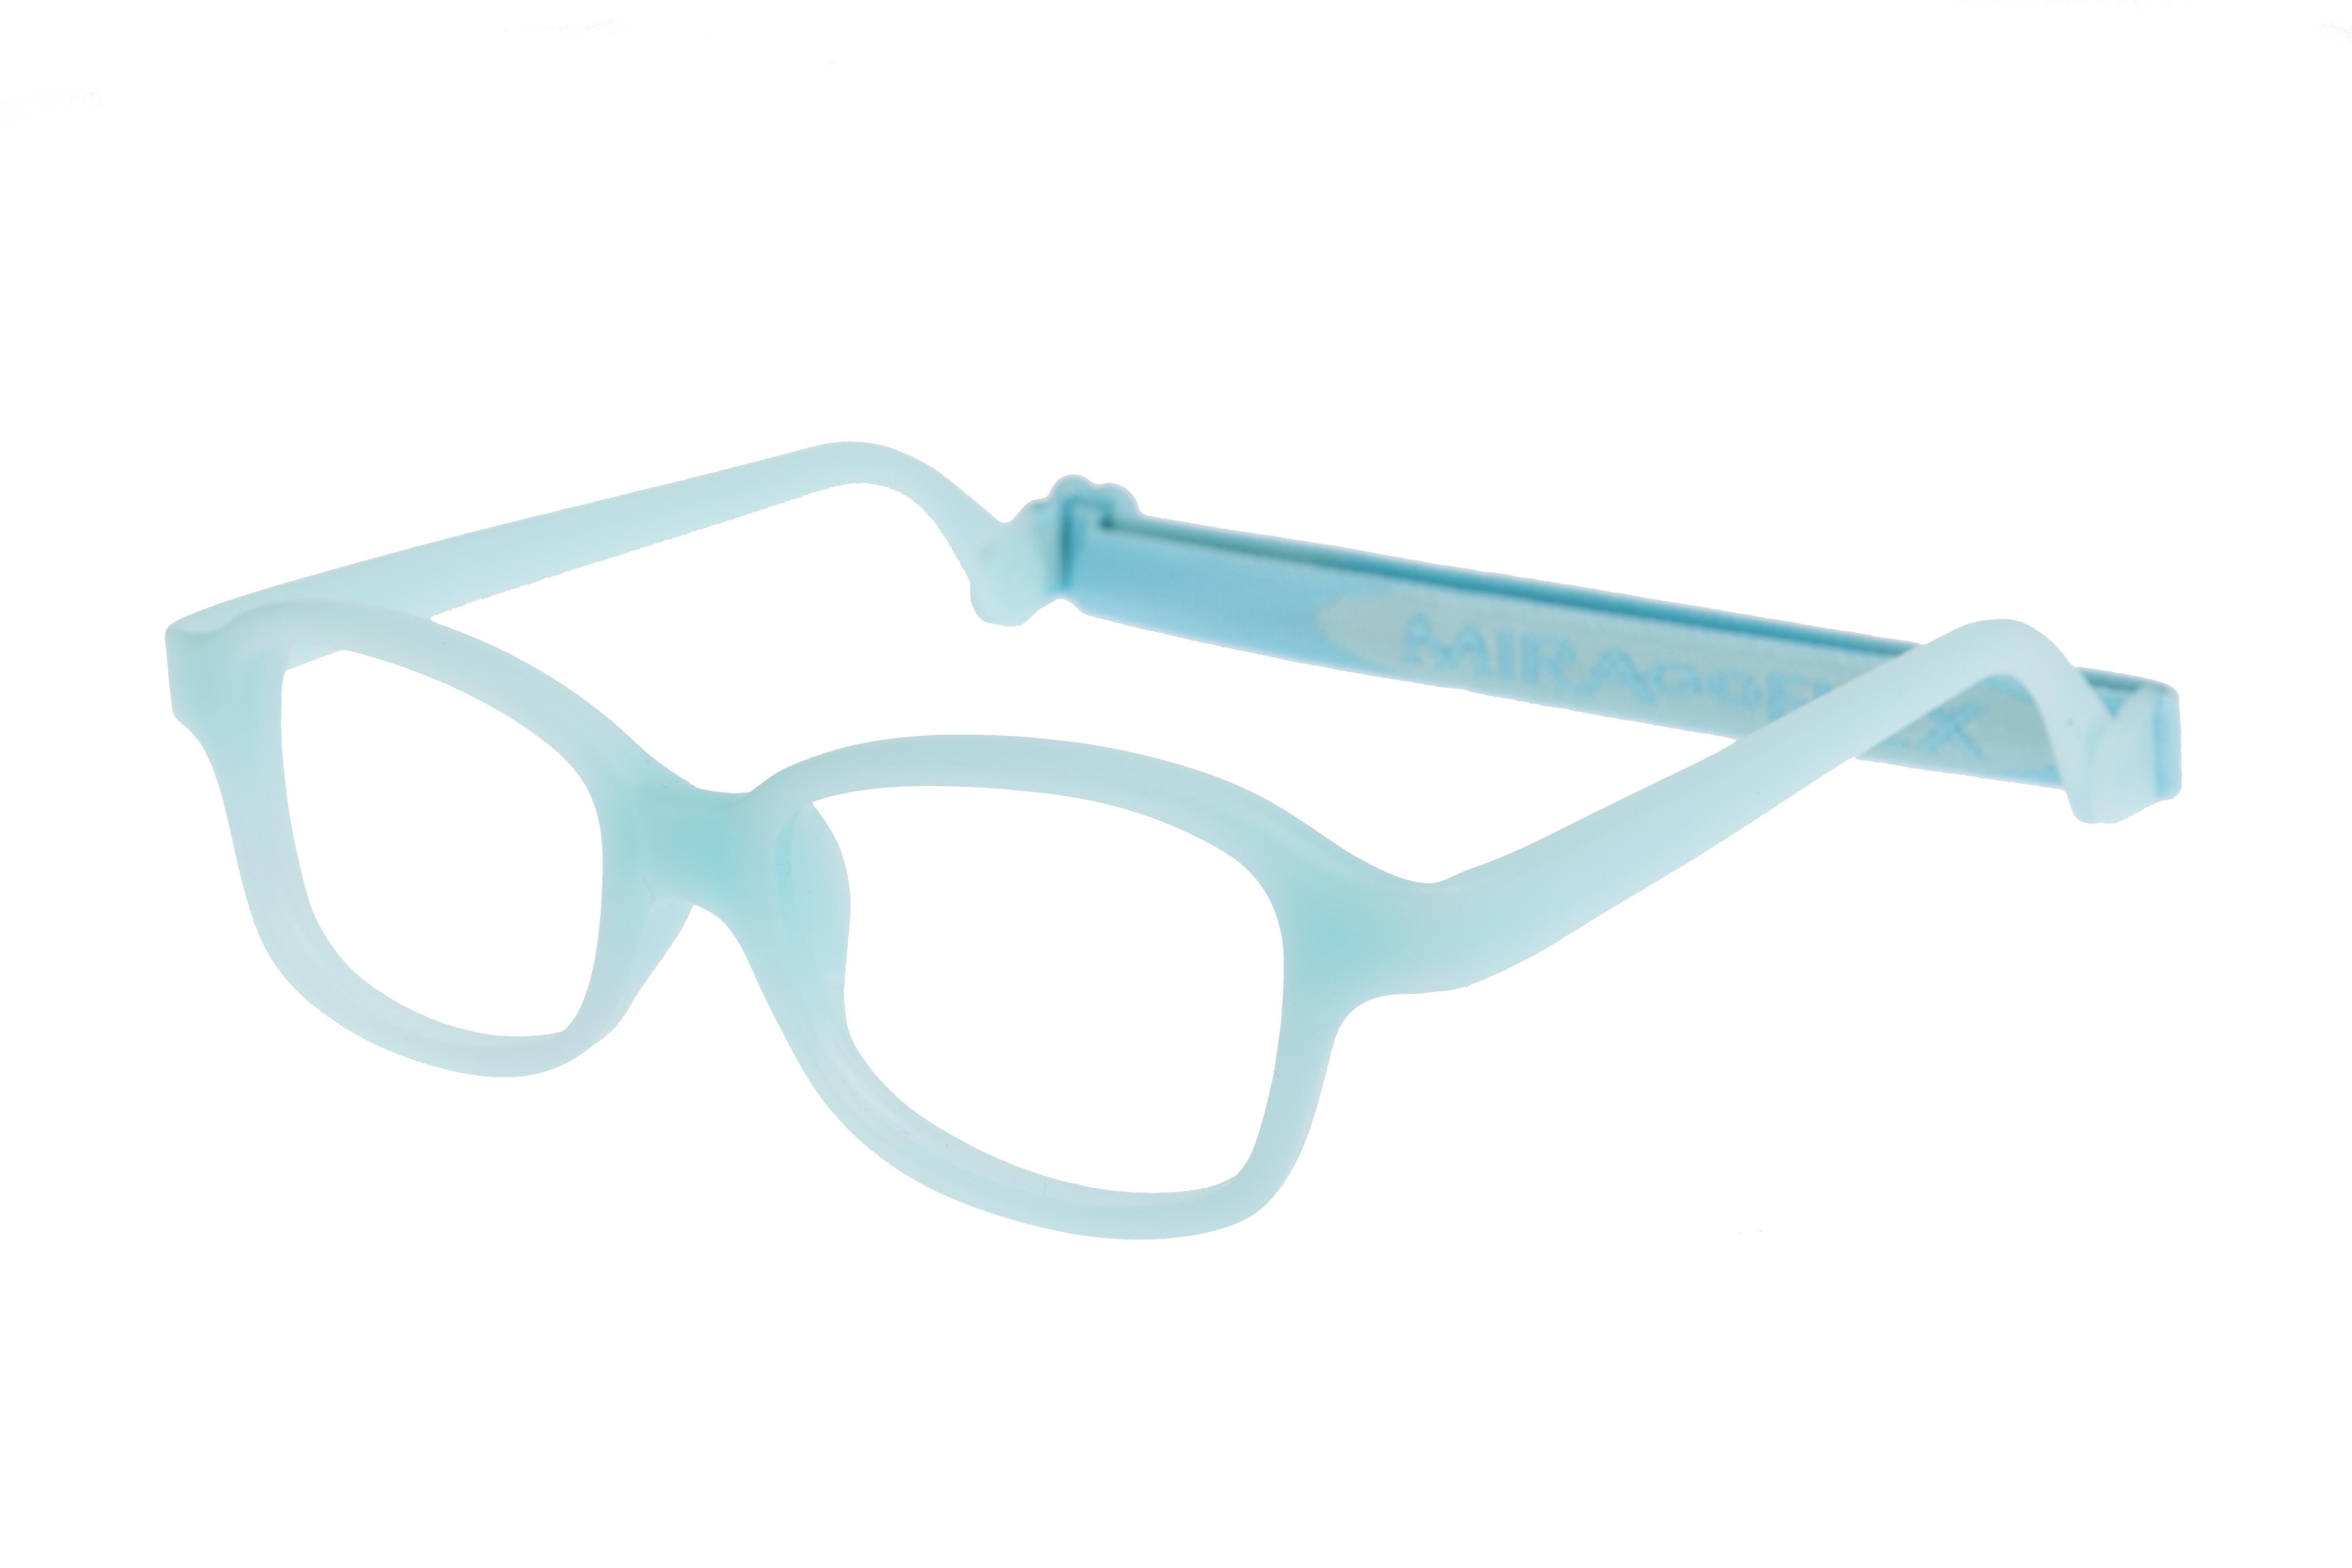 4cbab73fcf3 Eyewear for Kids - Girl 4-6 years Miraflex - Optiwow